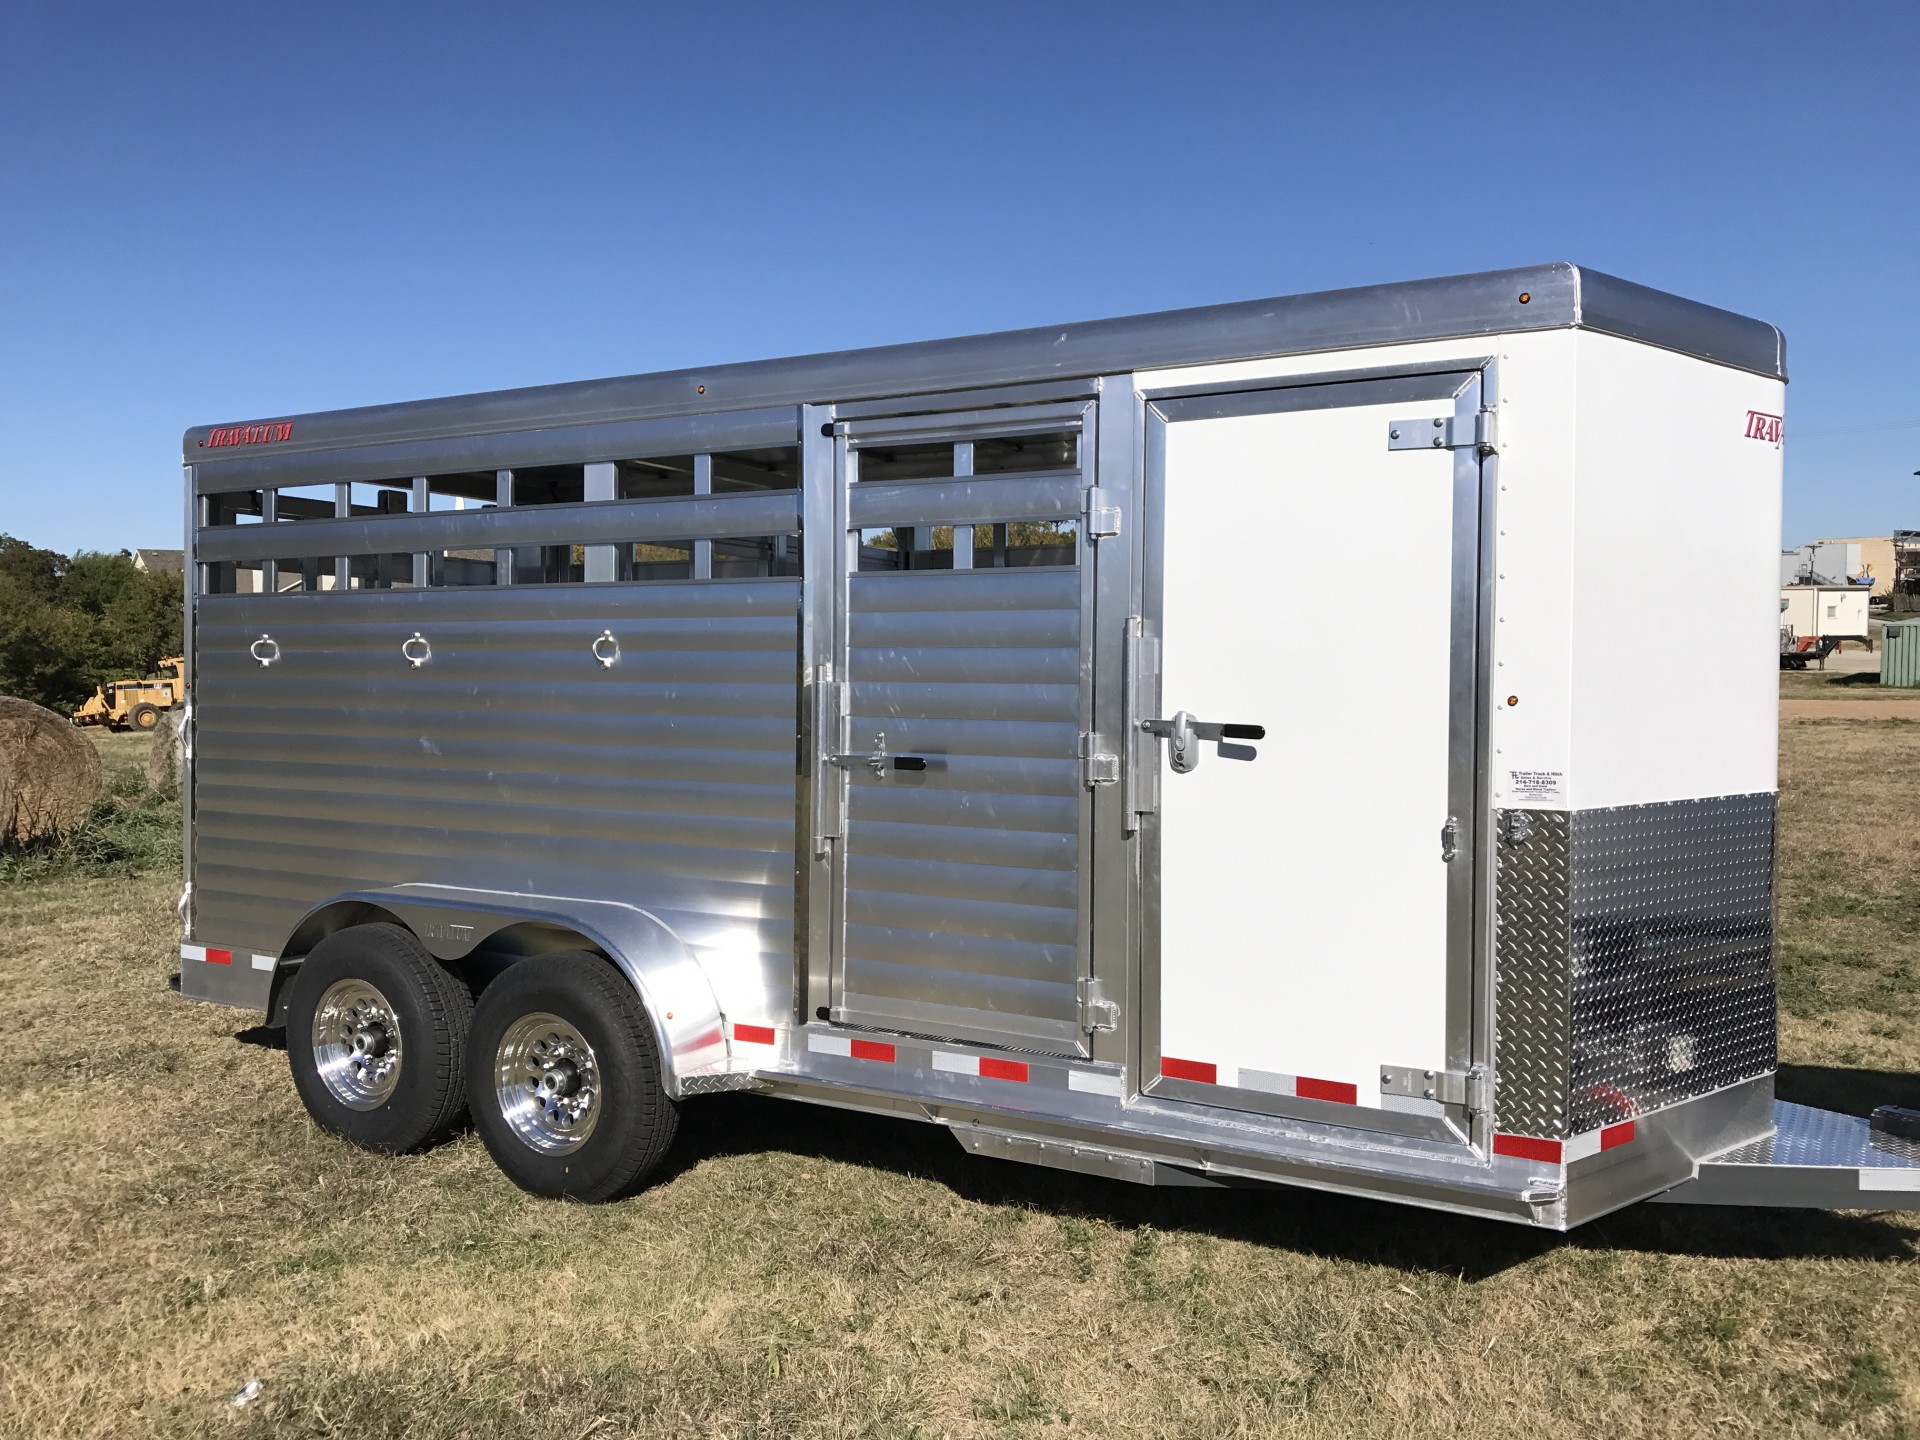 2018 Travalum rancher bp